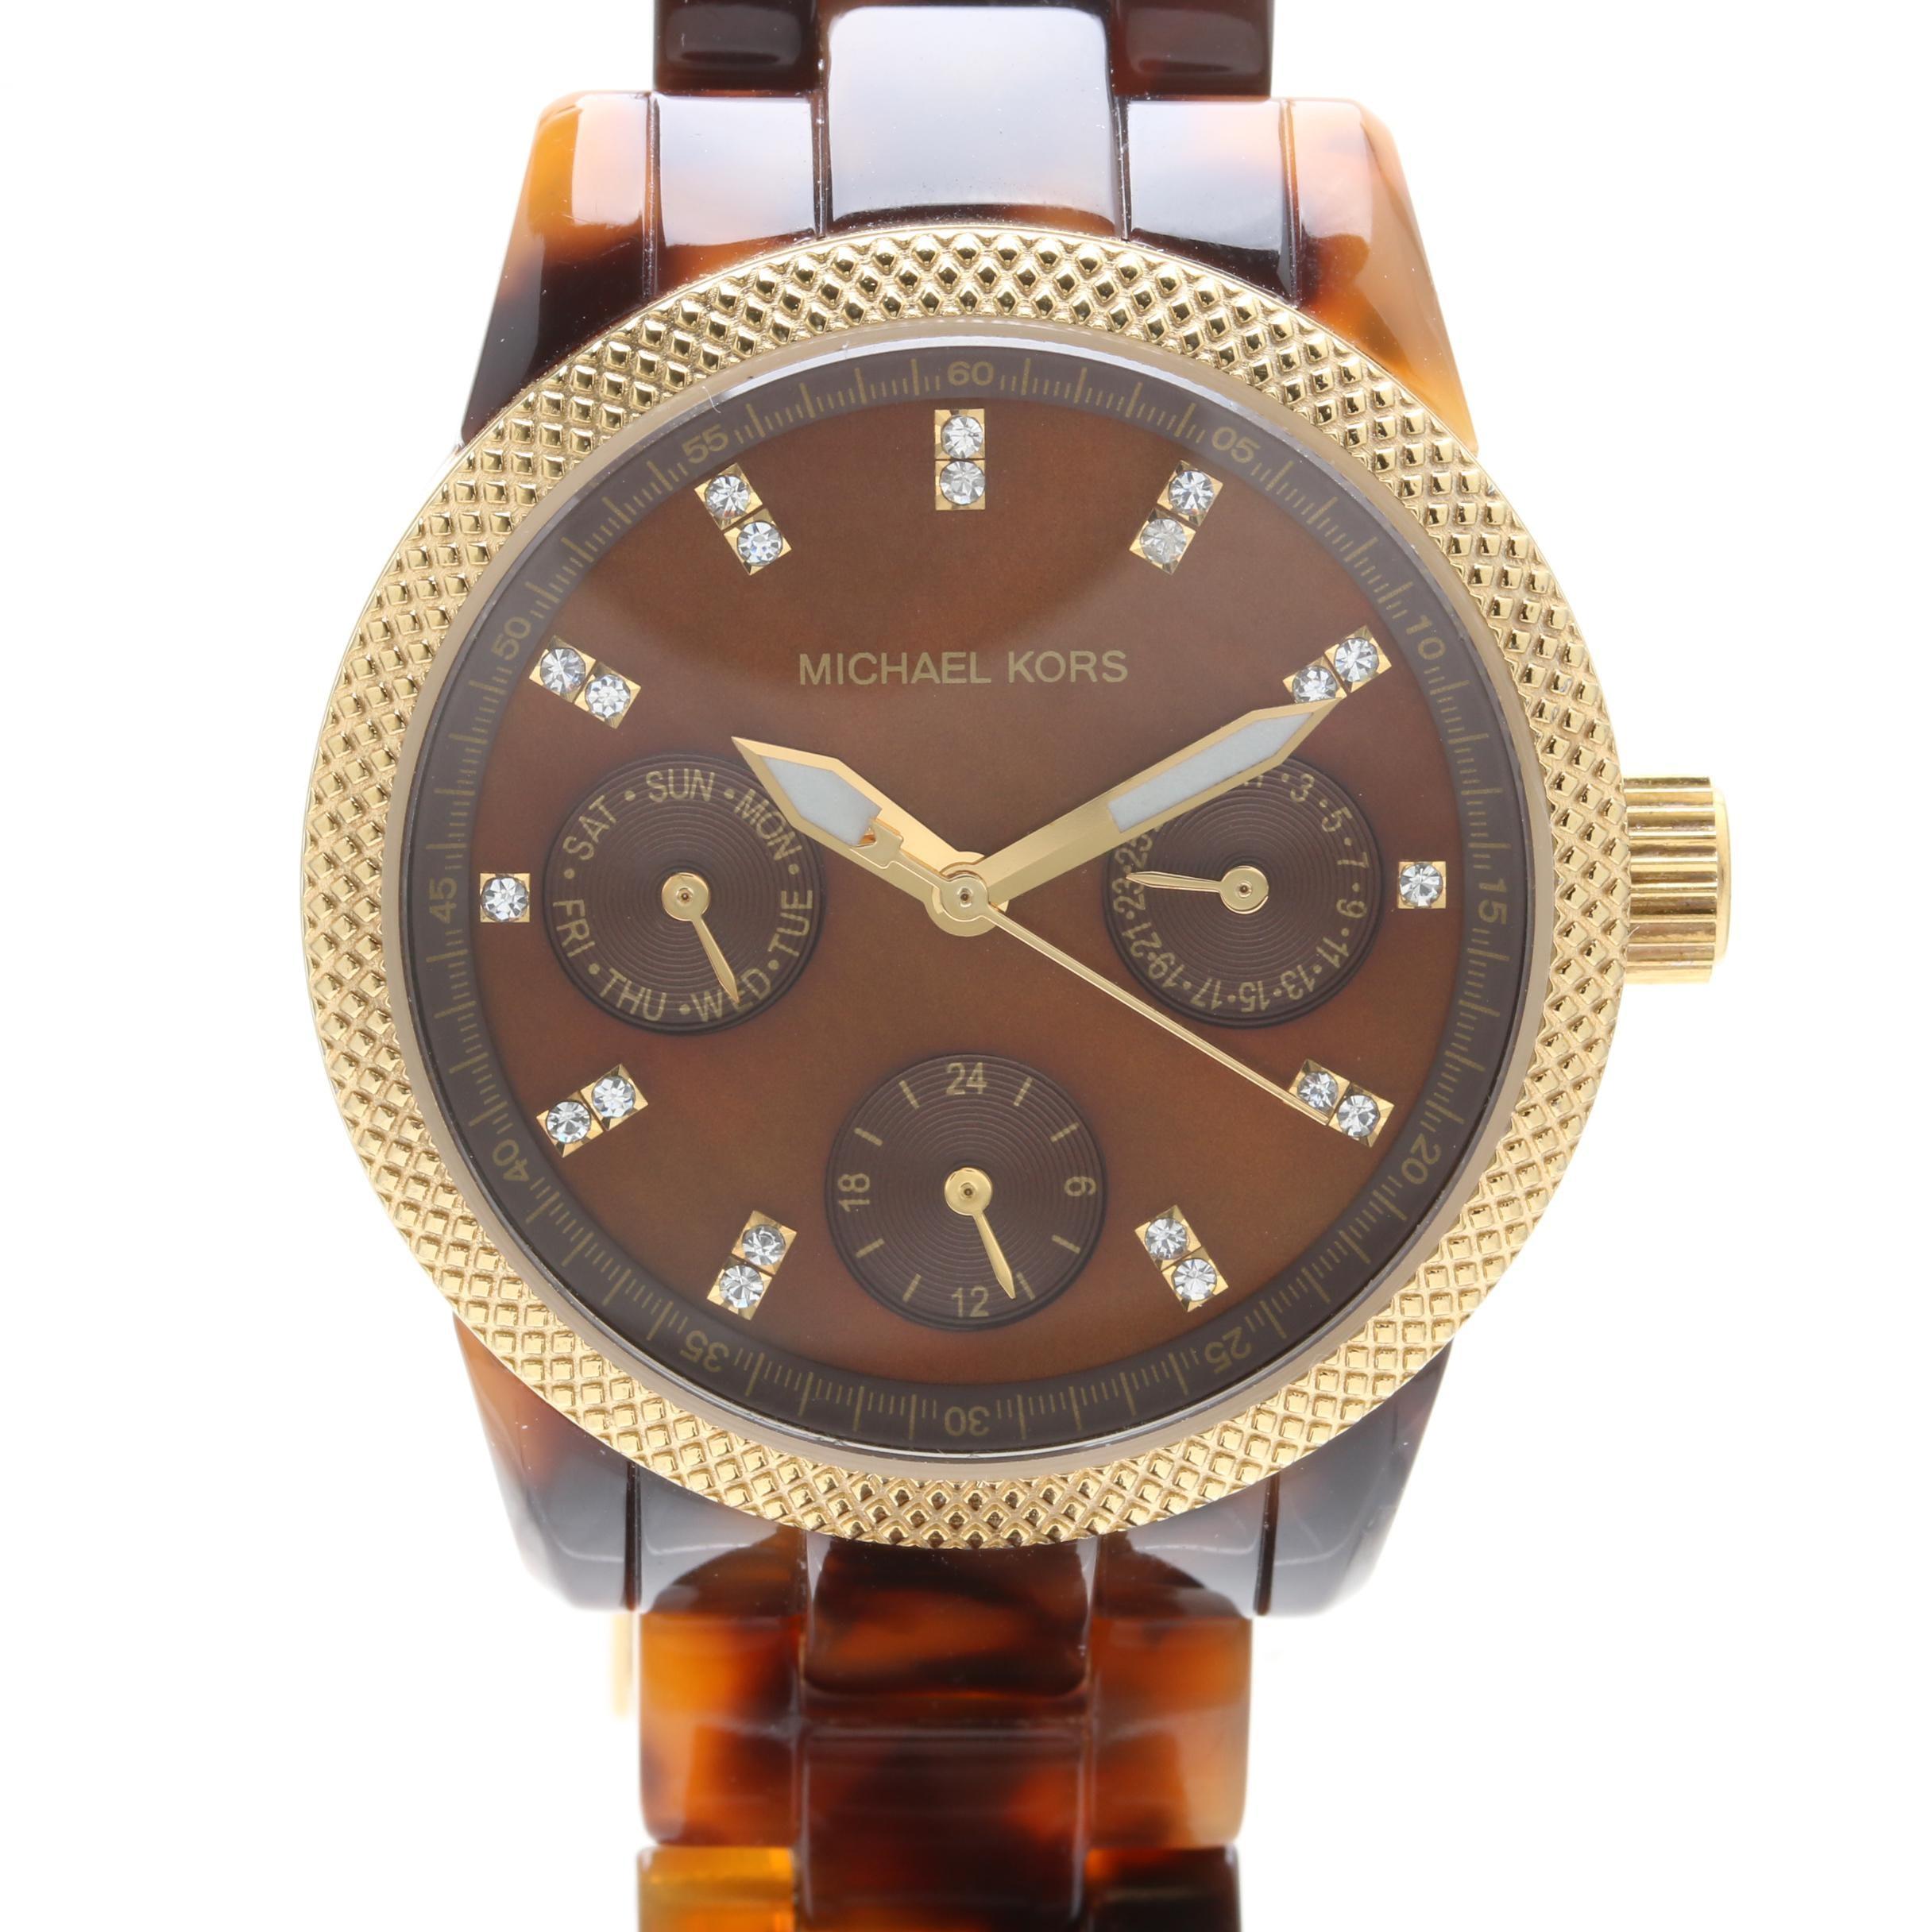 Michael Kors MK-5399 Mother of Pearl Mini Tortoise Acrylic Wristwatch